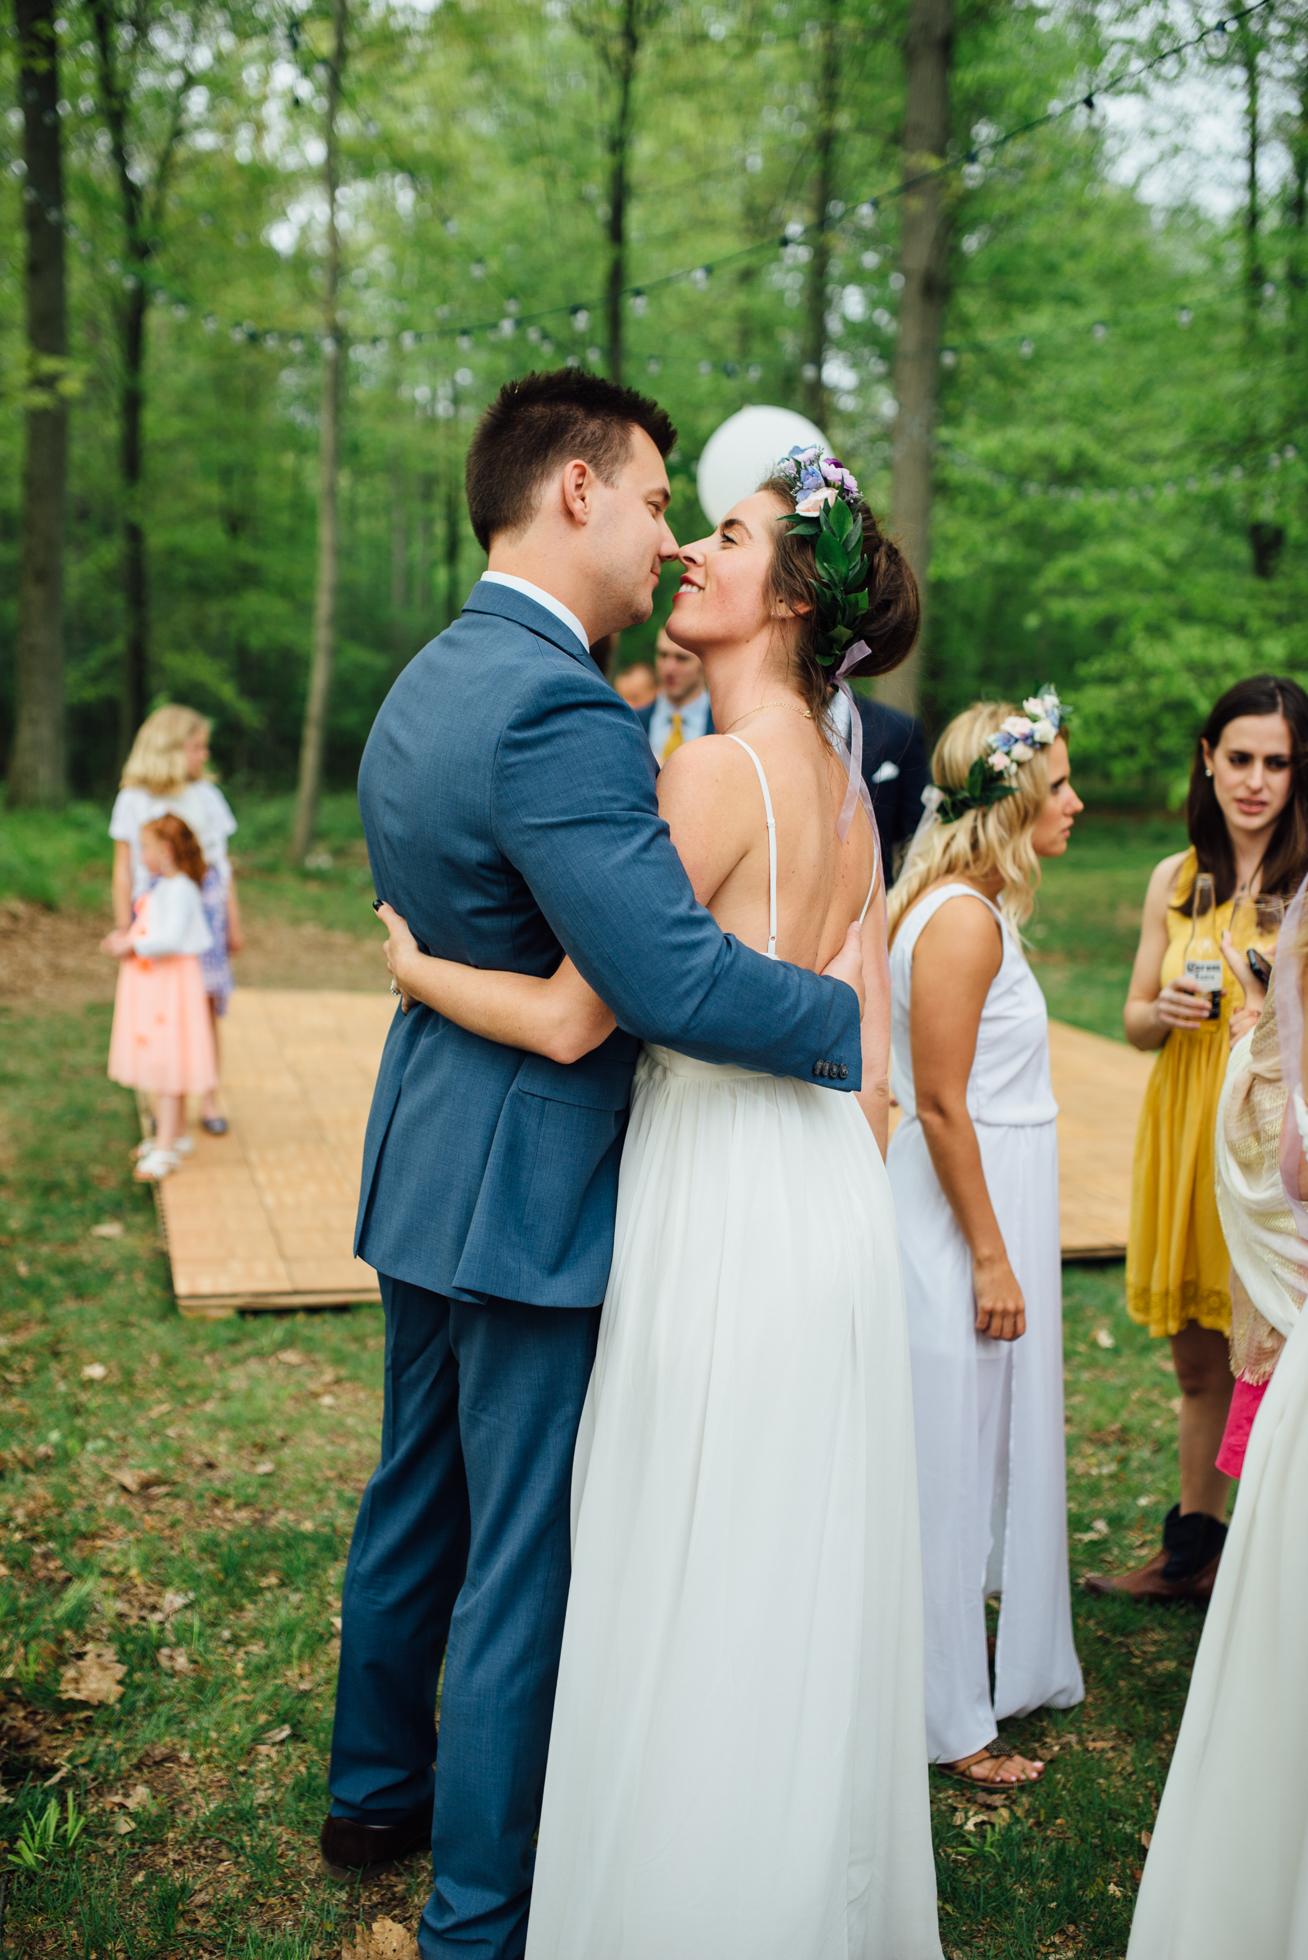 Outdoor wedding reception at Fernwood Hills in London, Ontario photographed by Sara Monika, Photographer.